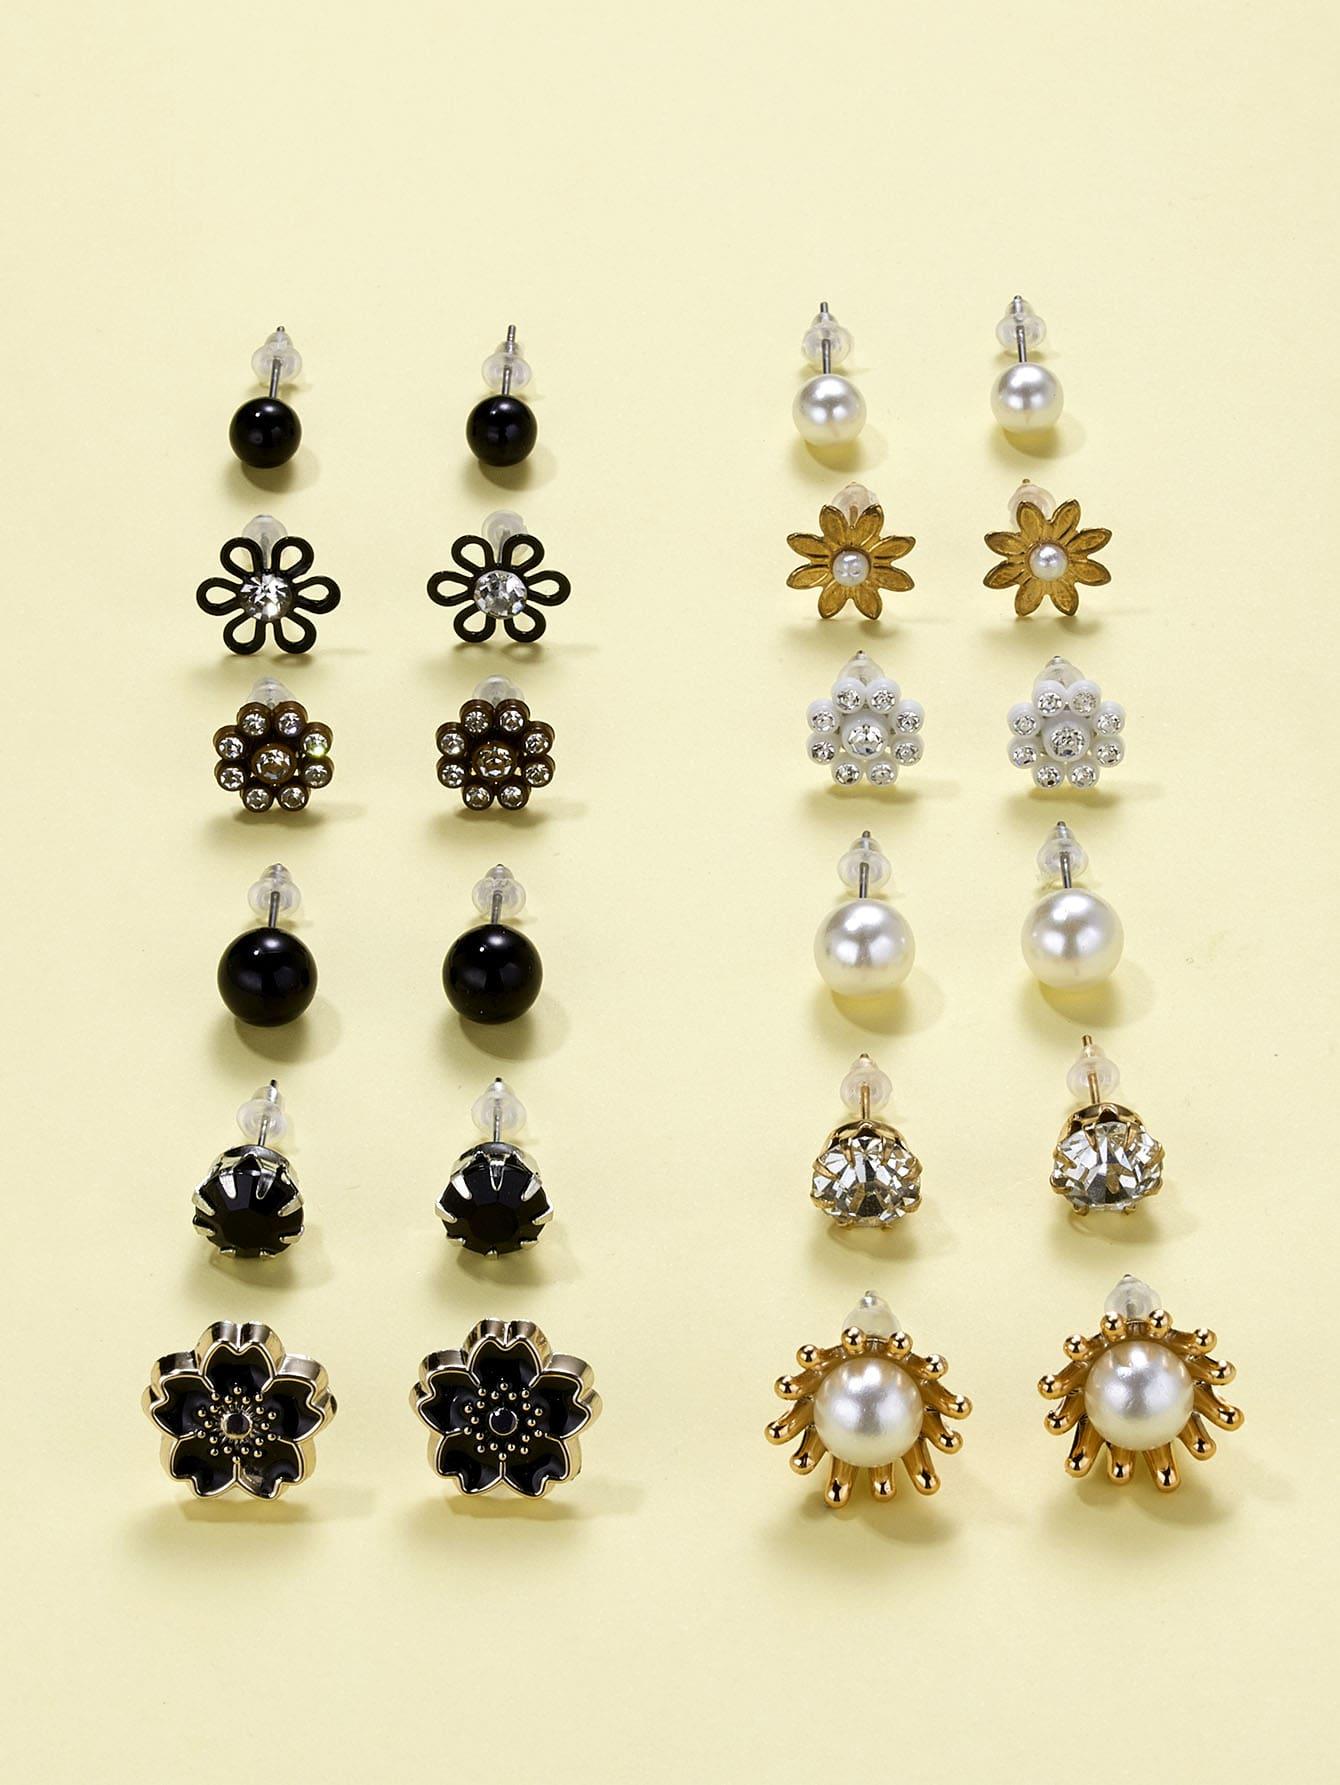 12pairs Faux Pearl Decor Flower Design Stud Earrings thumbnail